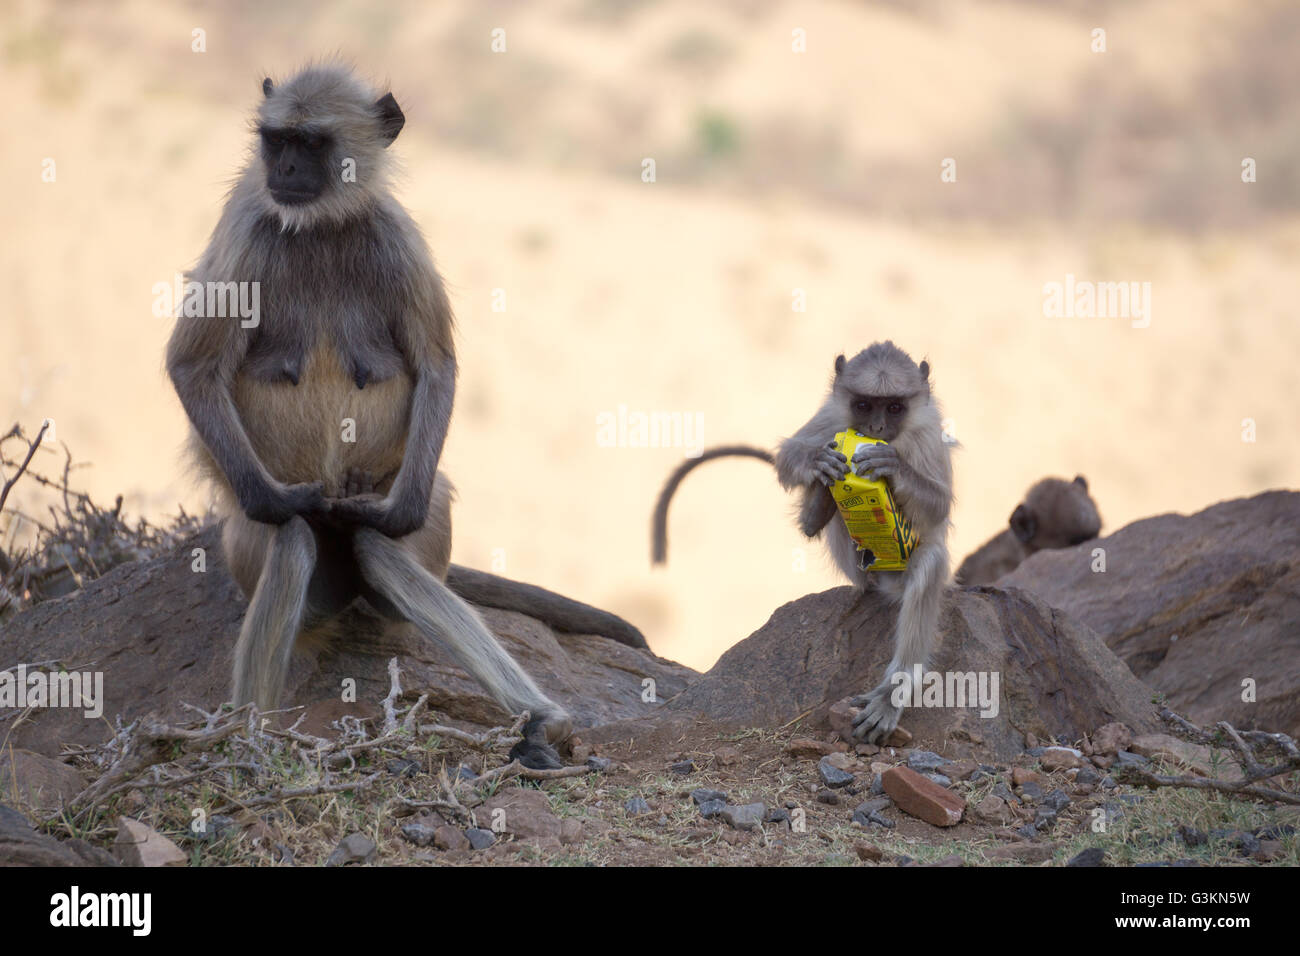 Monkey with plastic - Stock Image